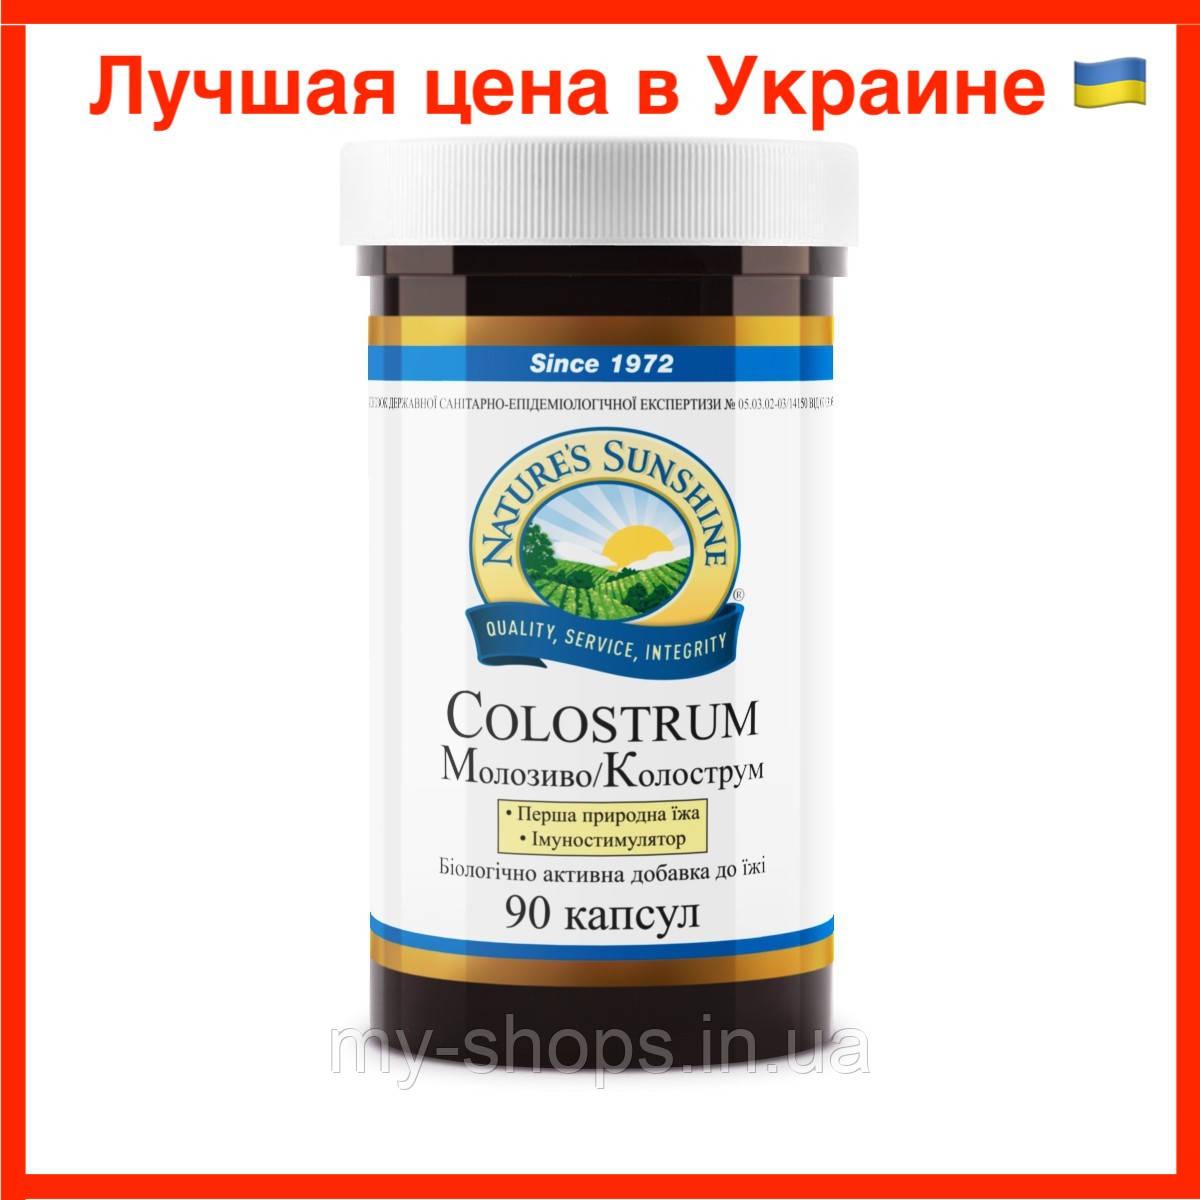 Колострум (Молозиво) НСП. Colostrum NSP. Колострум NSP. Натуральная БИОДОБАВКА